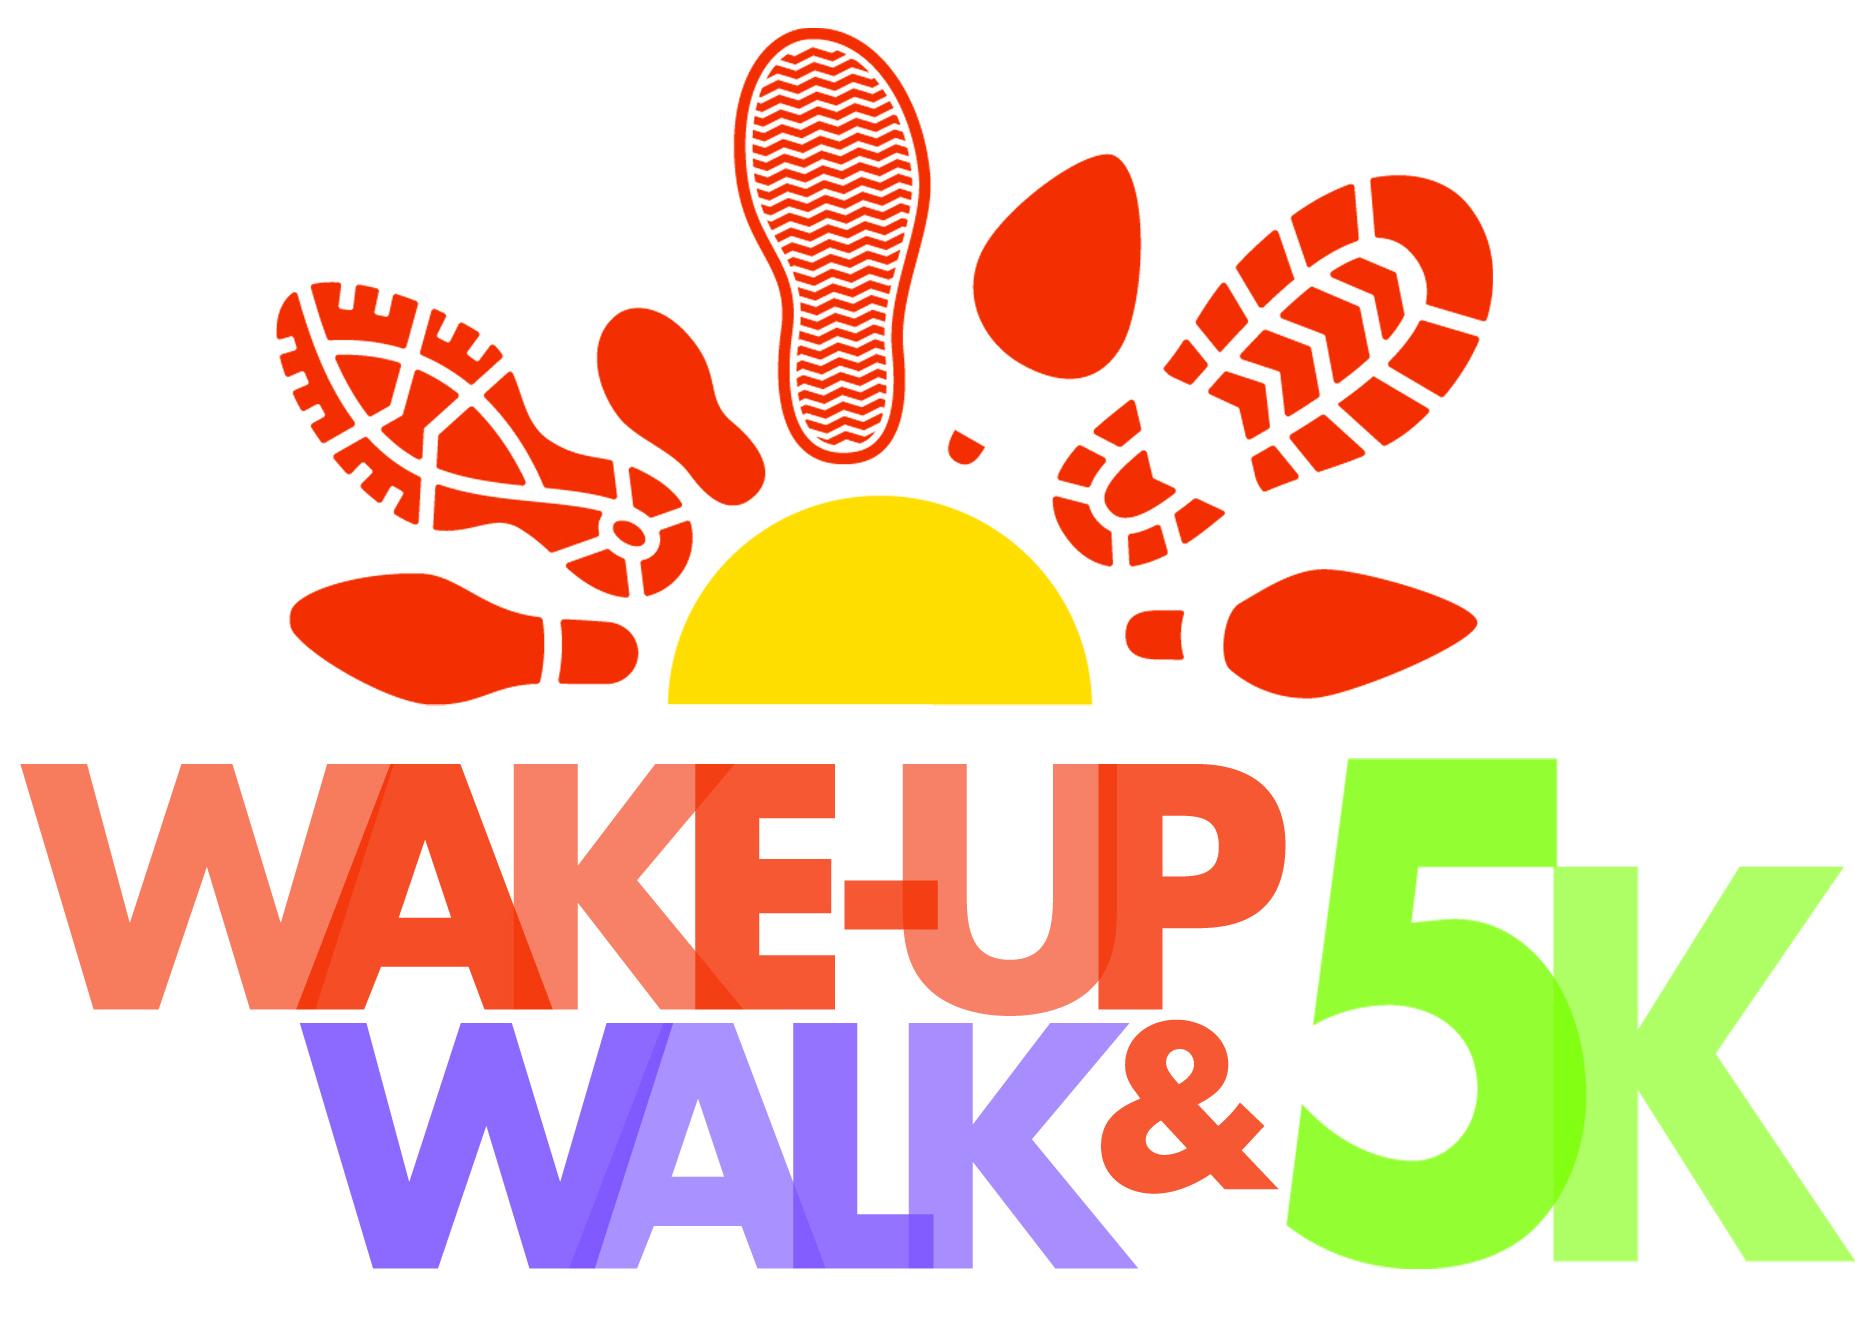 Wake-Up Walk & 5K